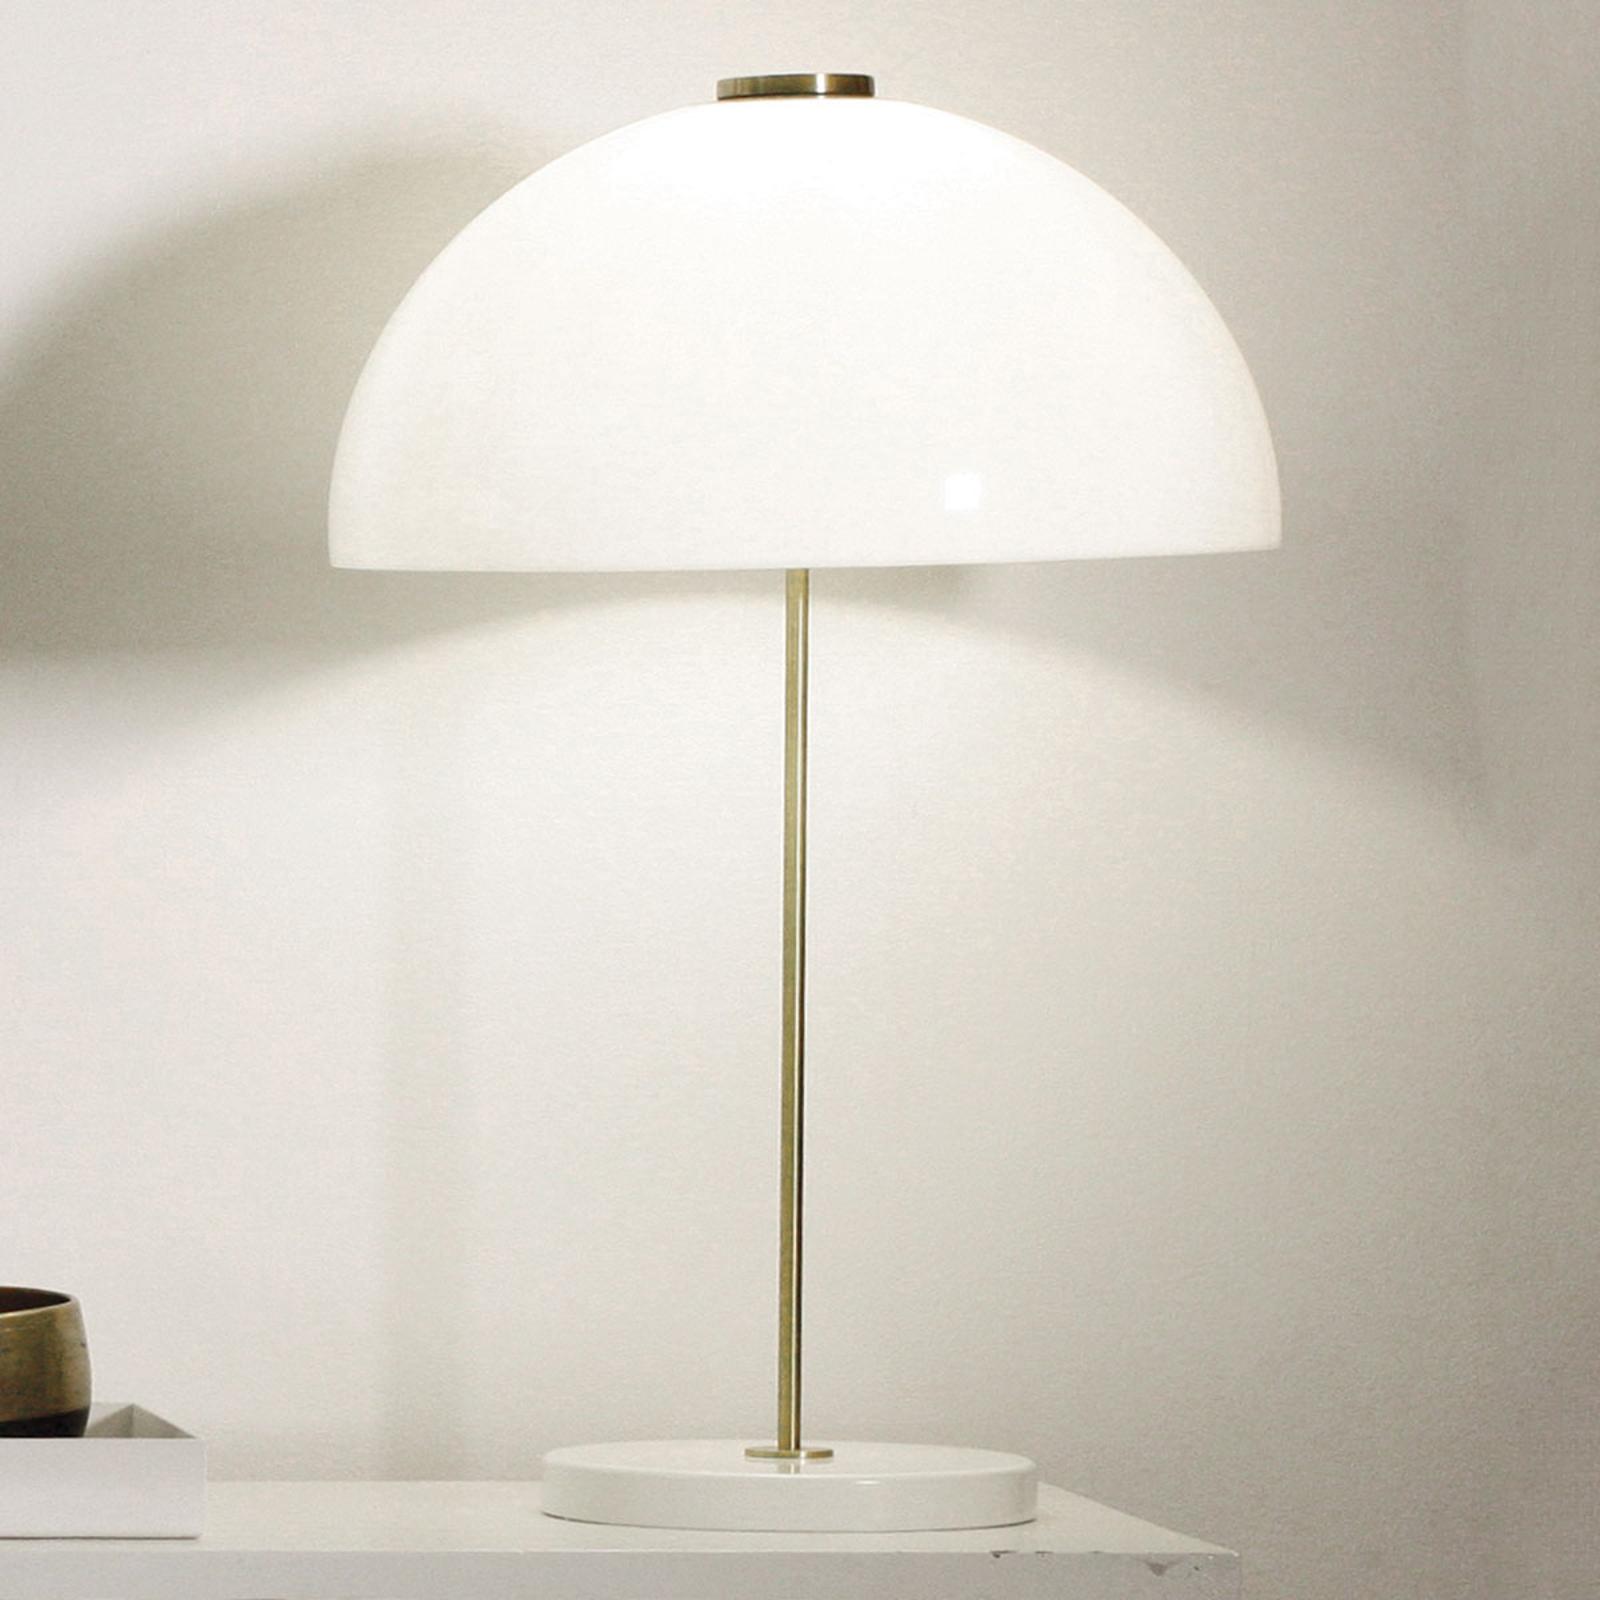 Innolux Kupoli lampe à poser pied blanc